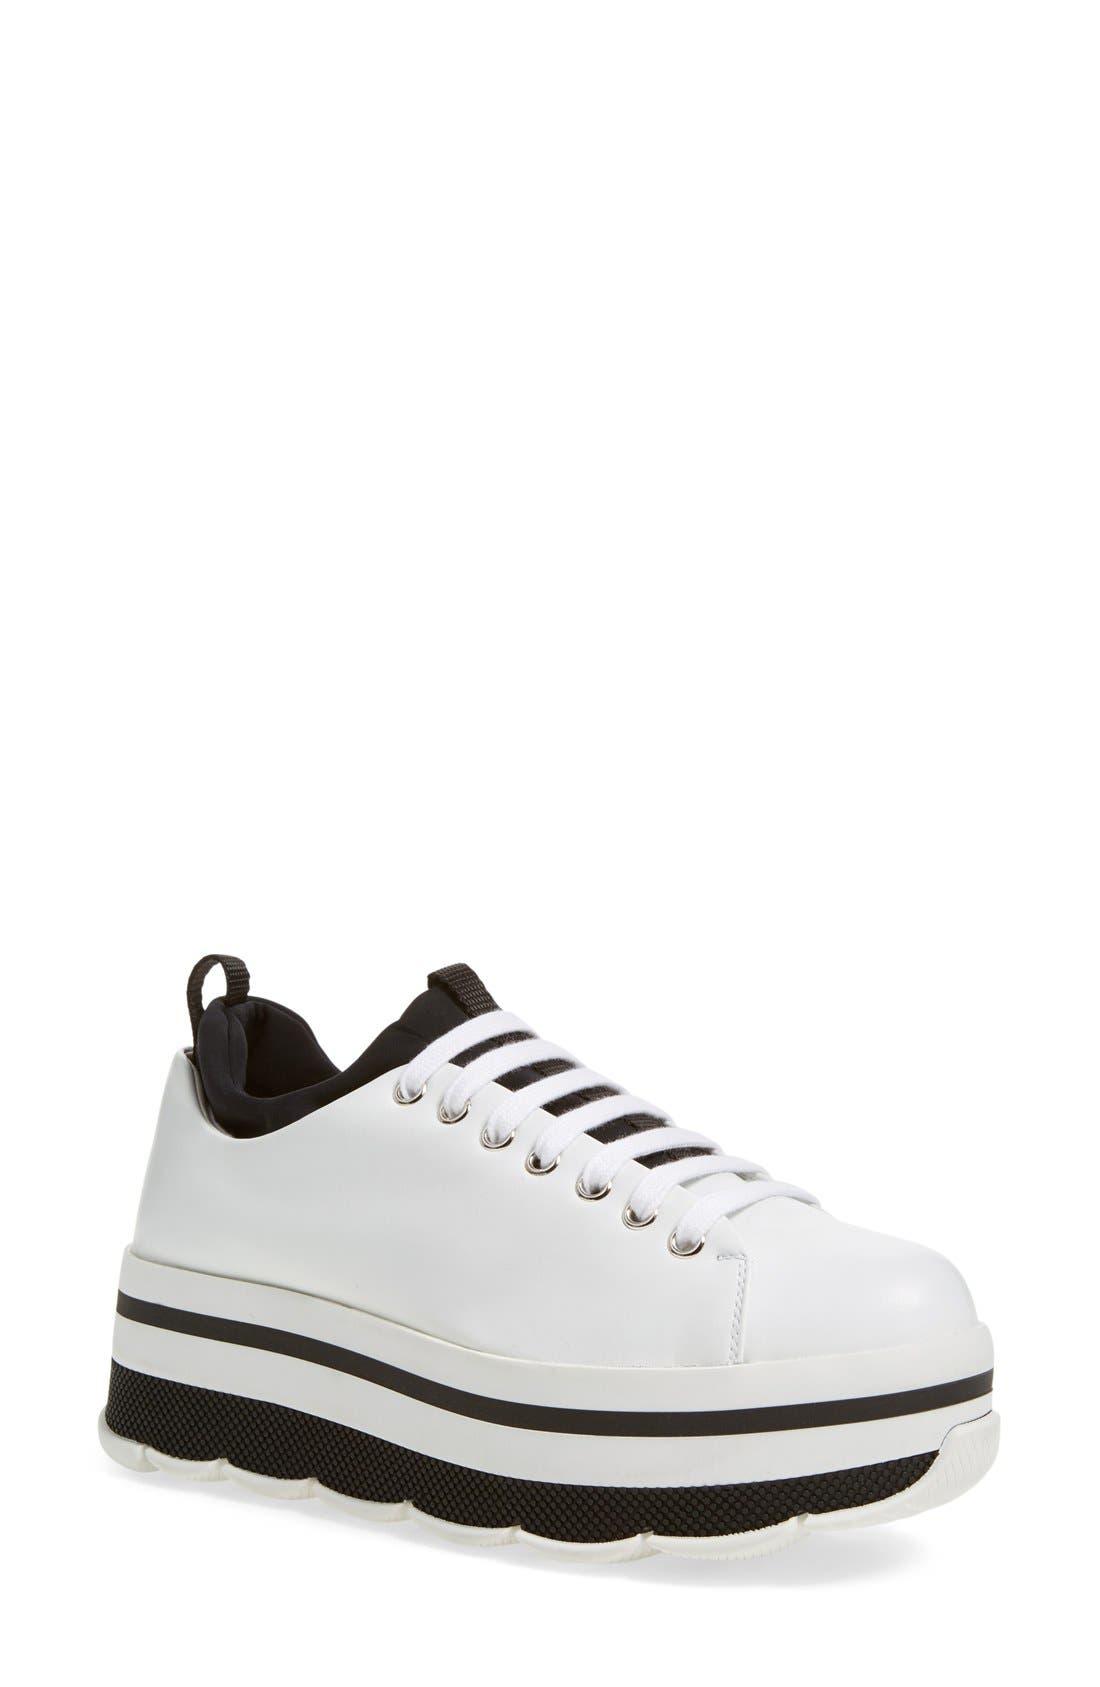 Main Image - Prada Linea Rossa Platform Sneaker (Women)